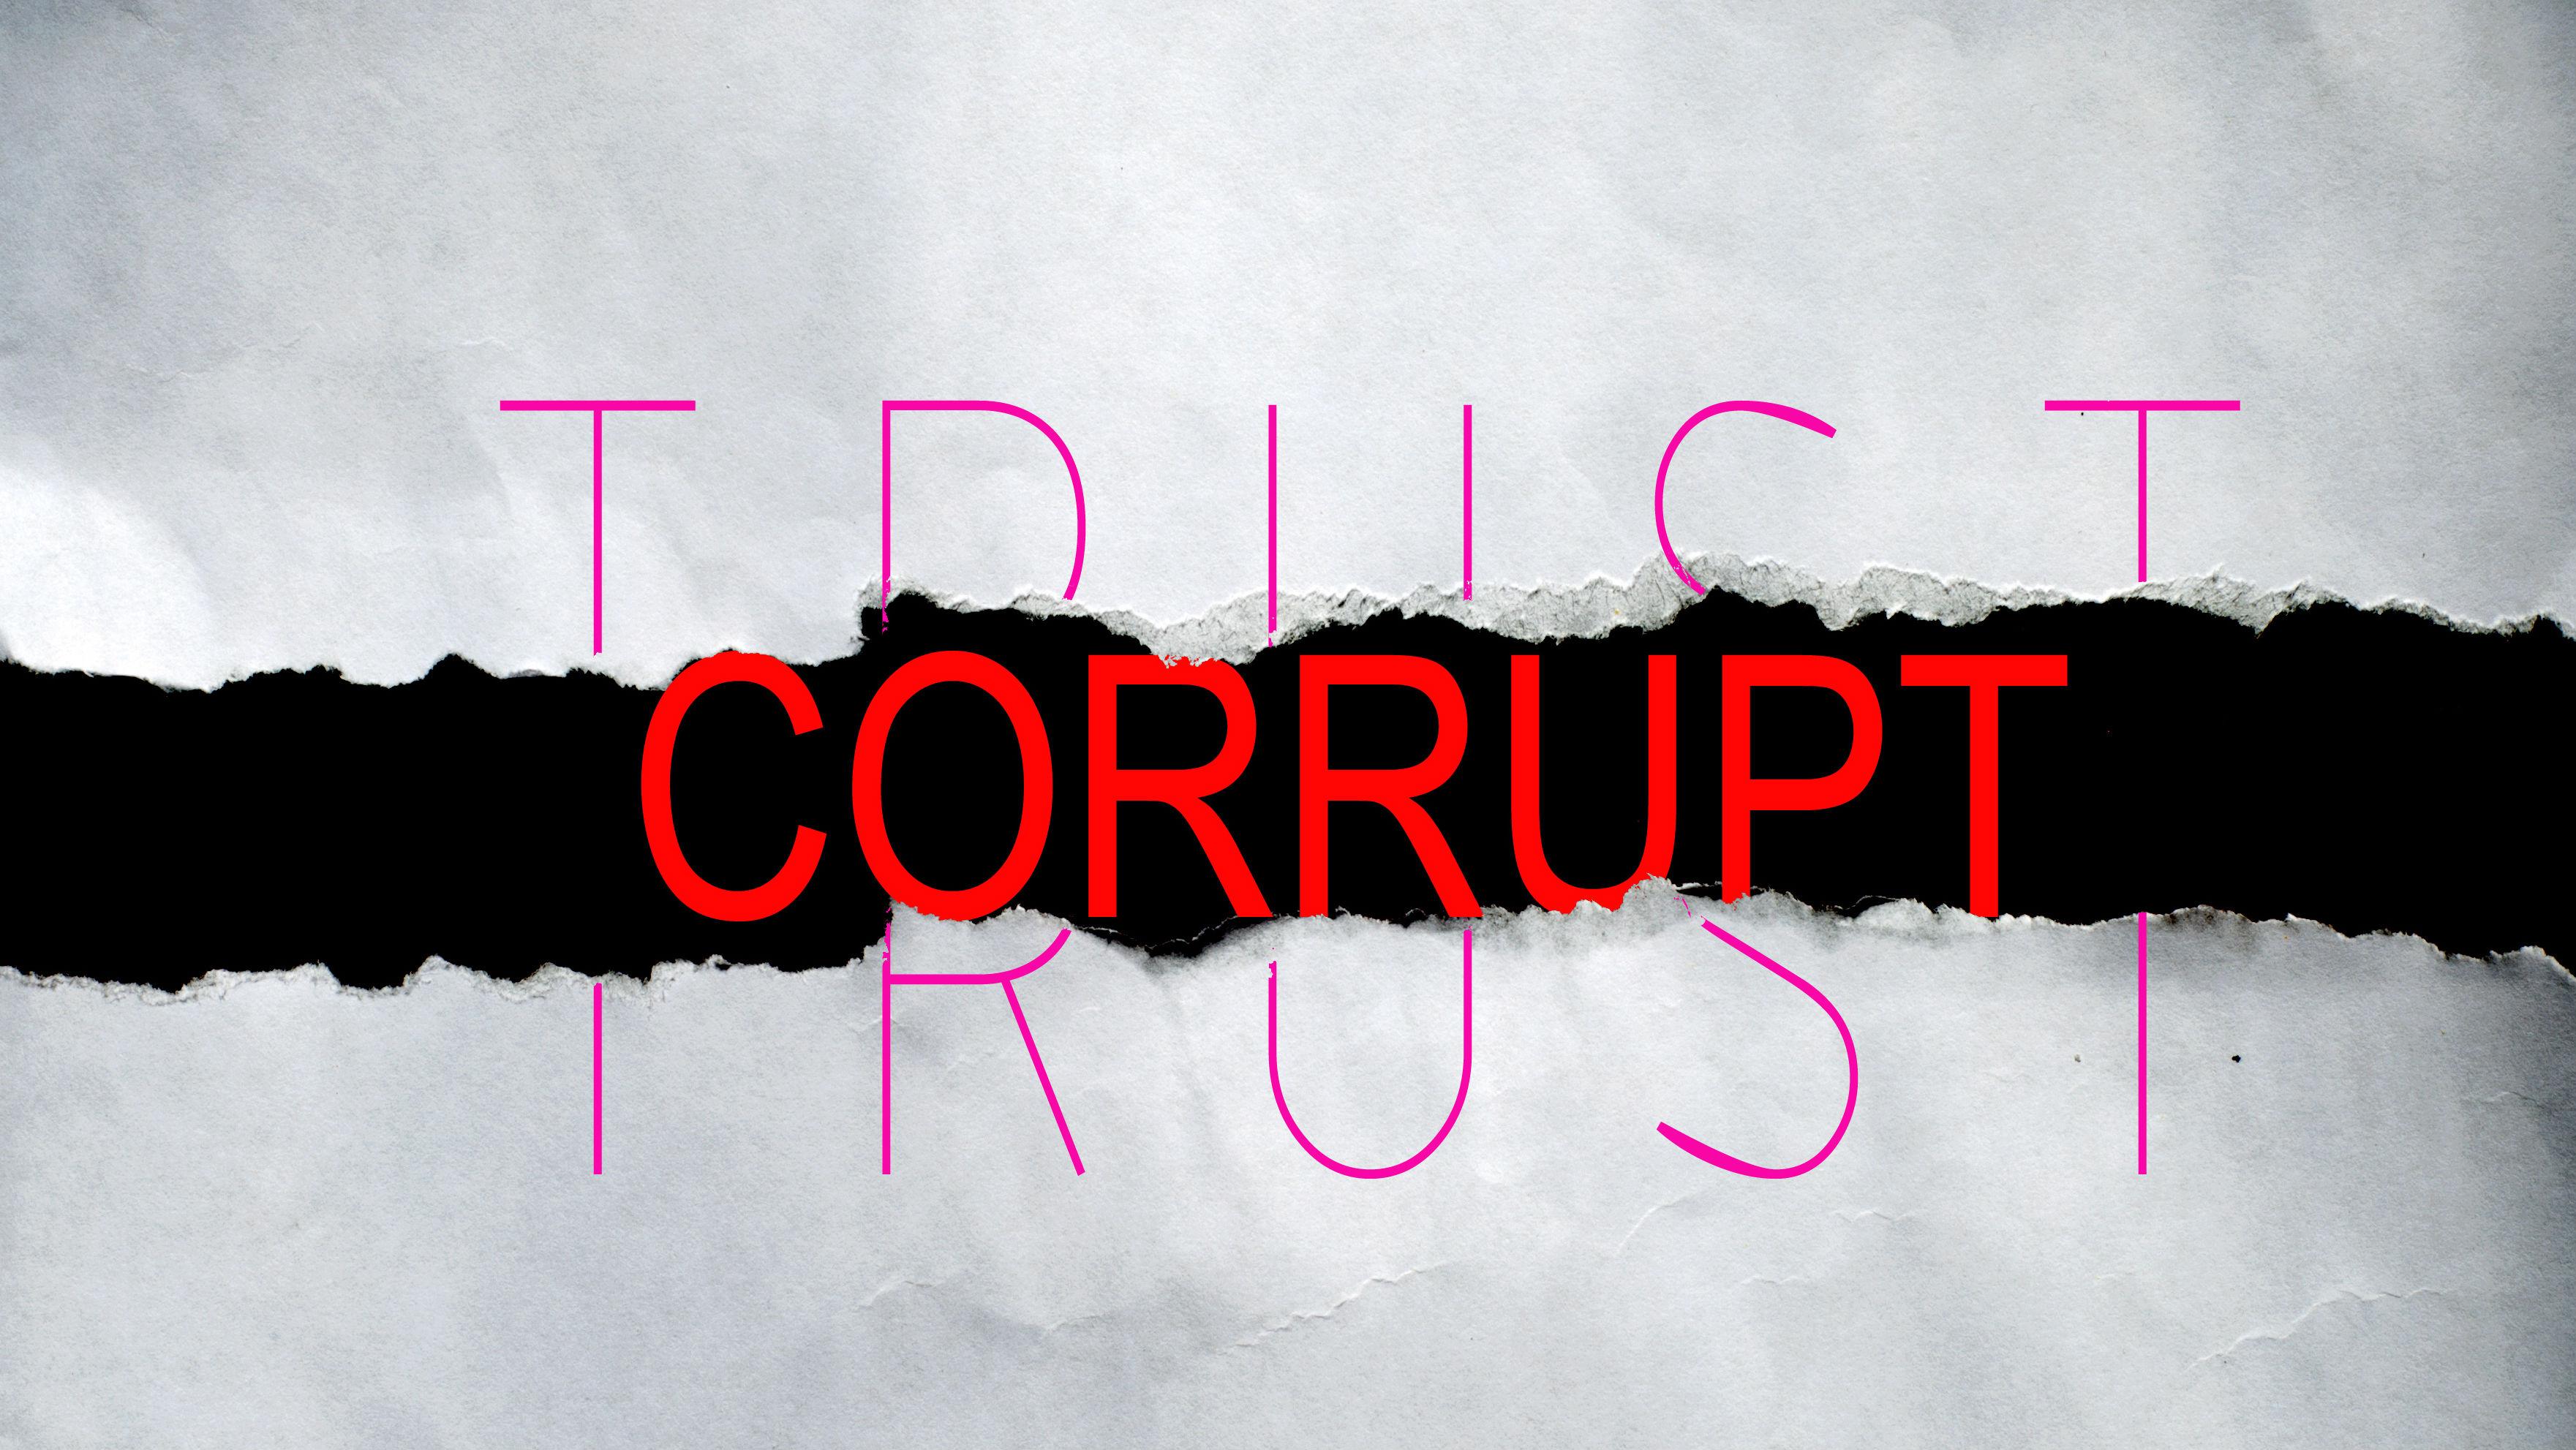 Anti Corruption Images international anti-corruption day - newsroom